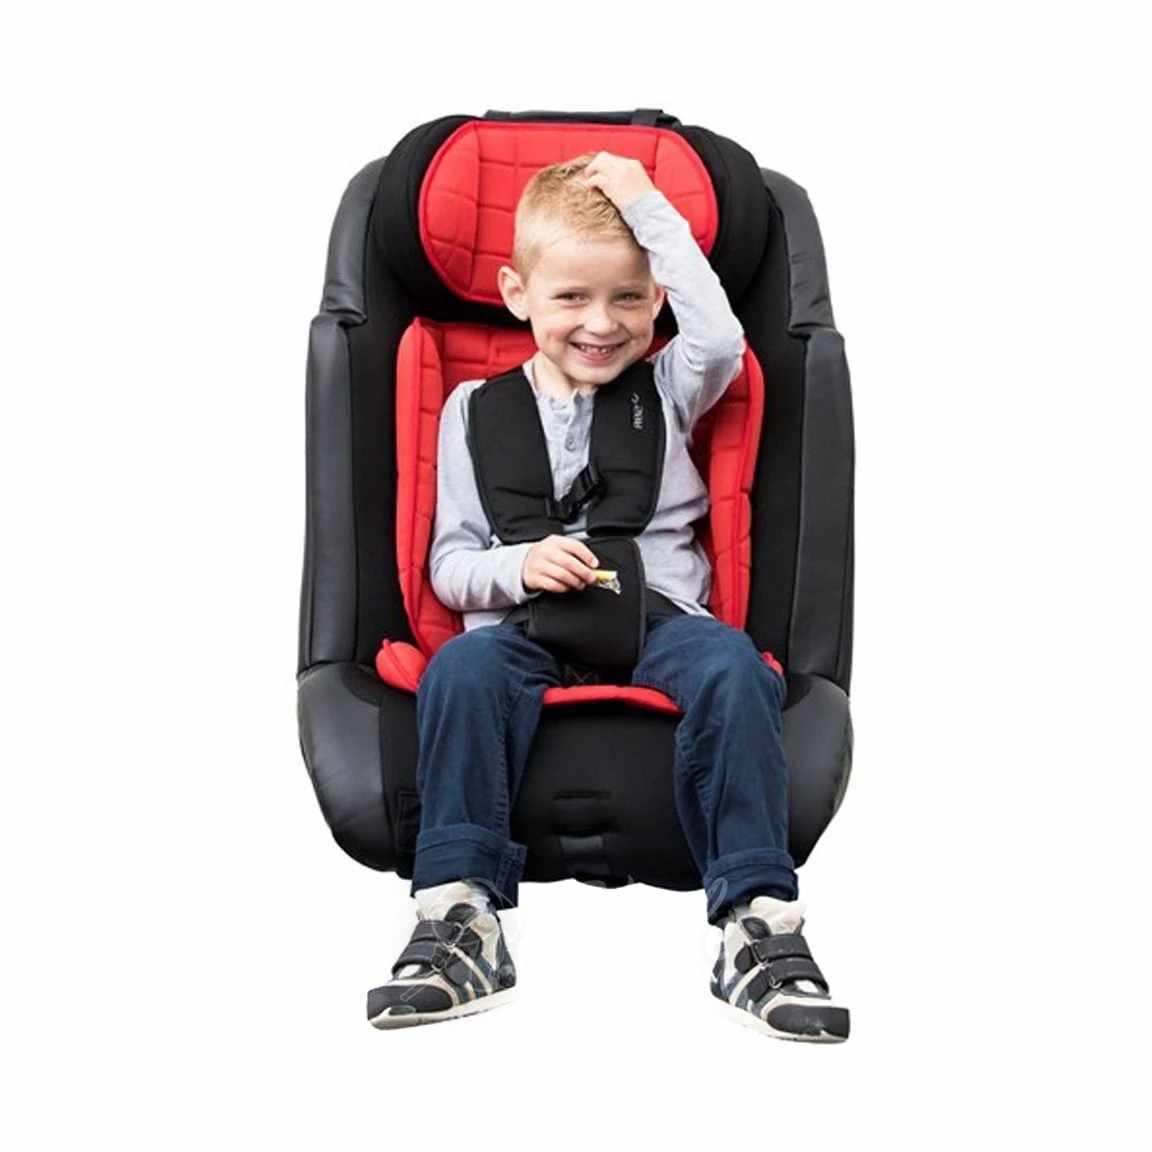 R82 Wallaroo car seat